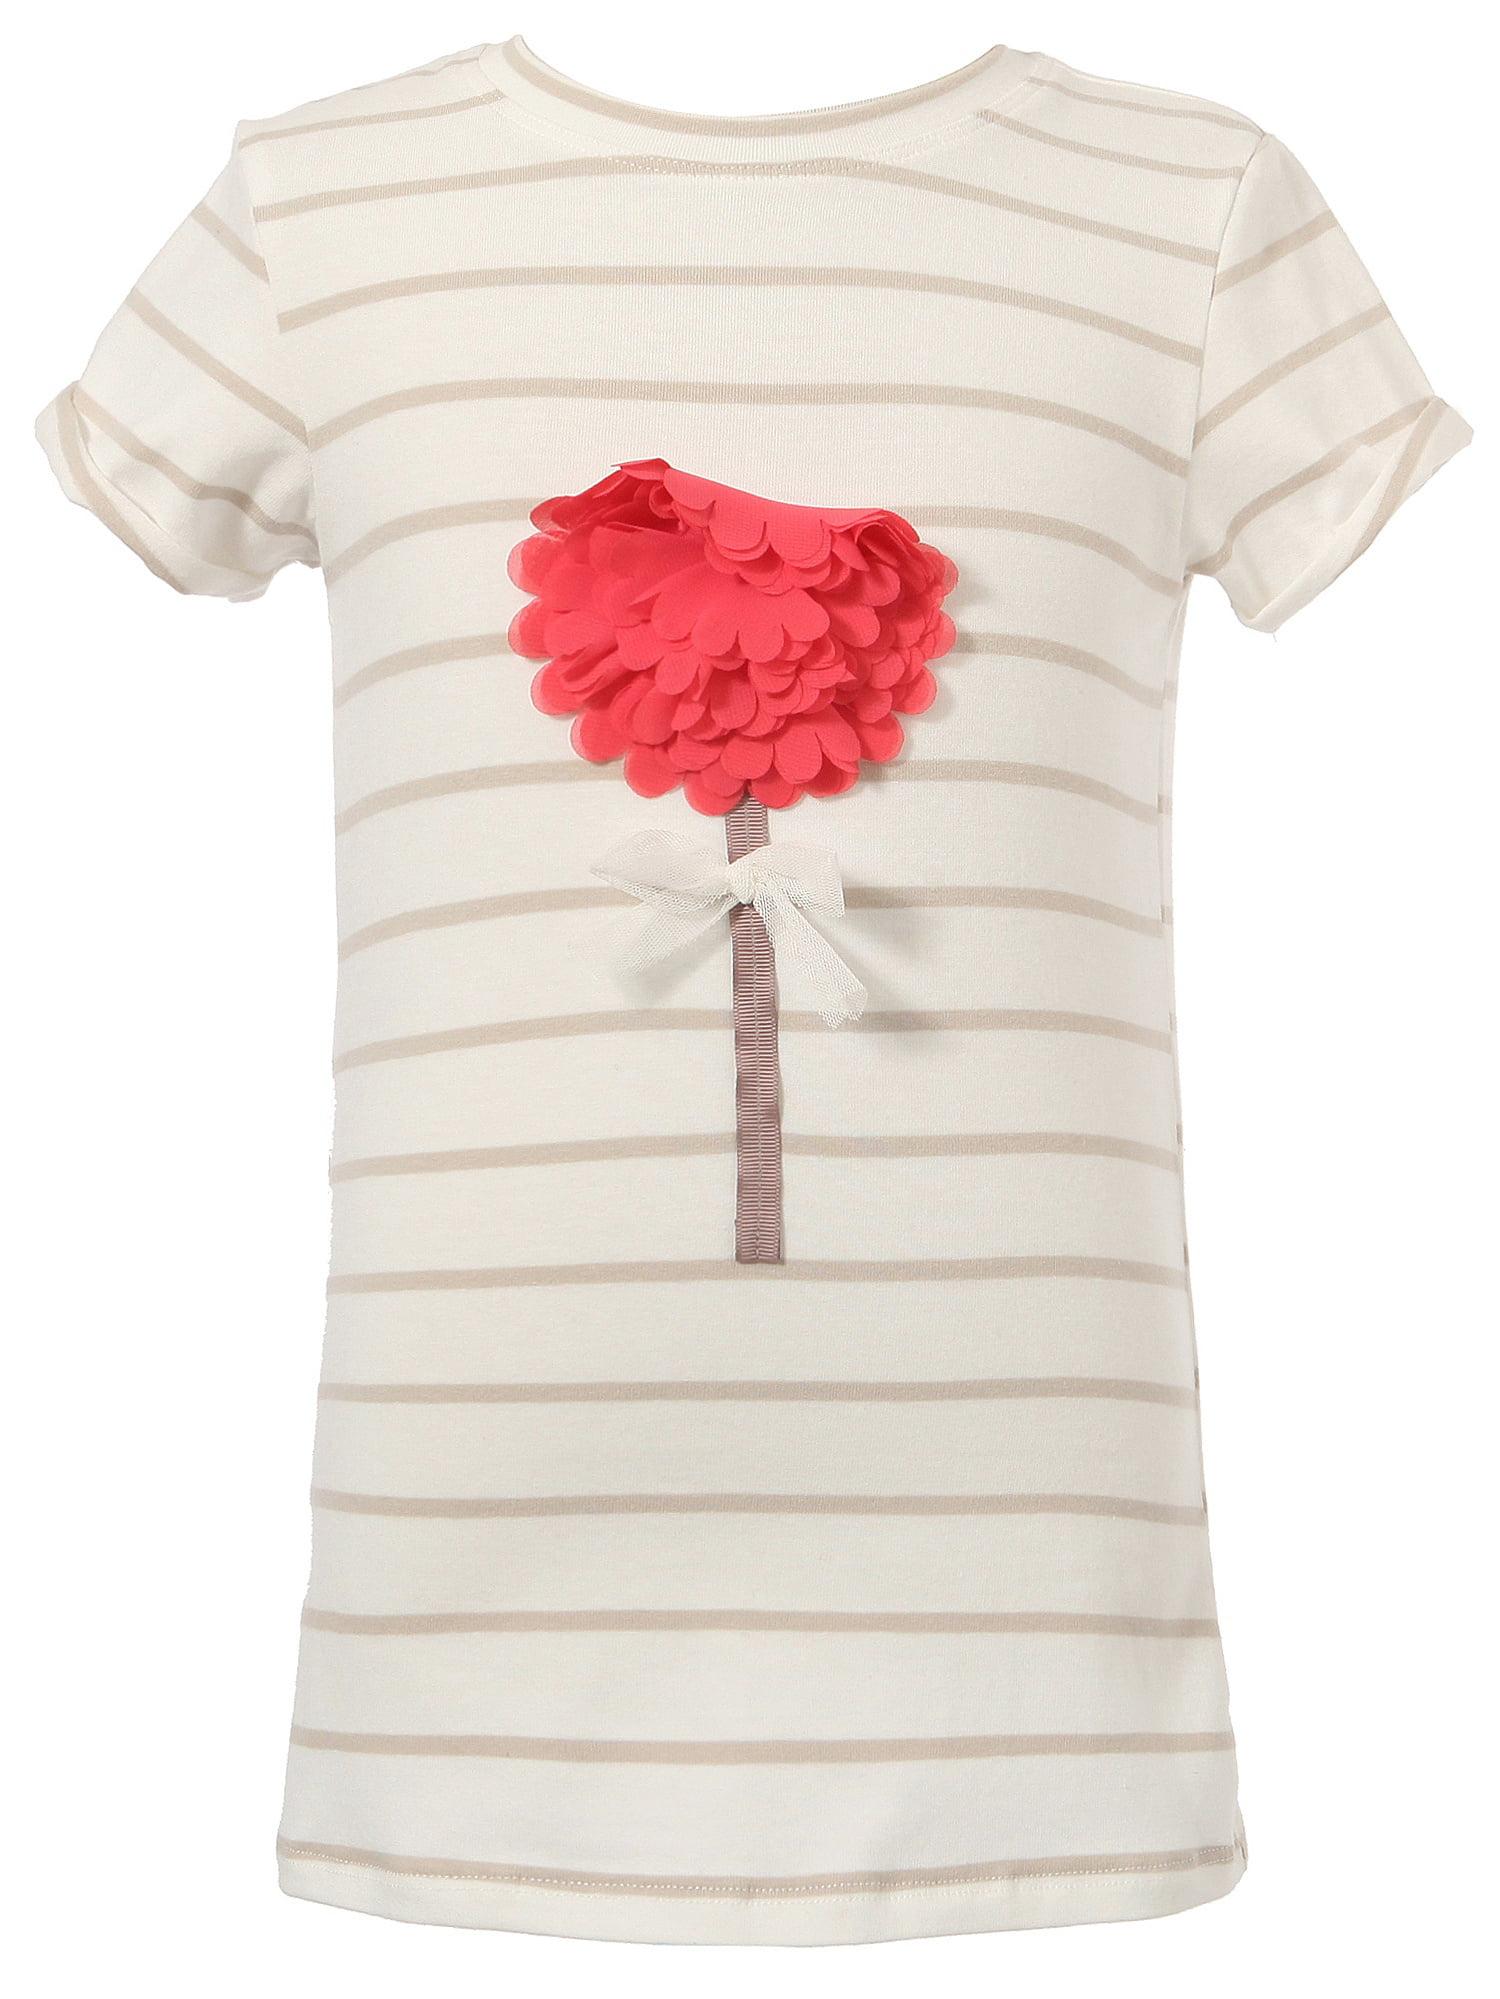 Richie House Girls' Striped Short Sleeve T-shirt with a Assembled Flower RH1870